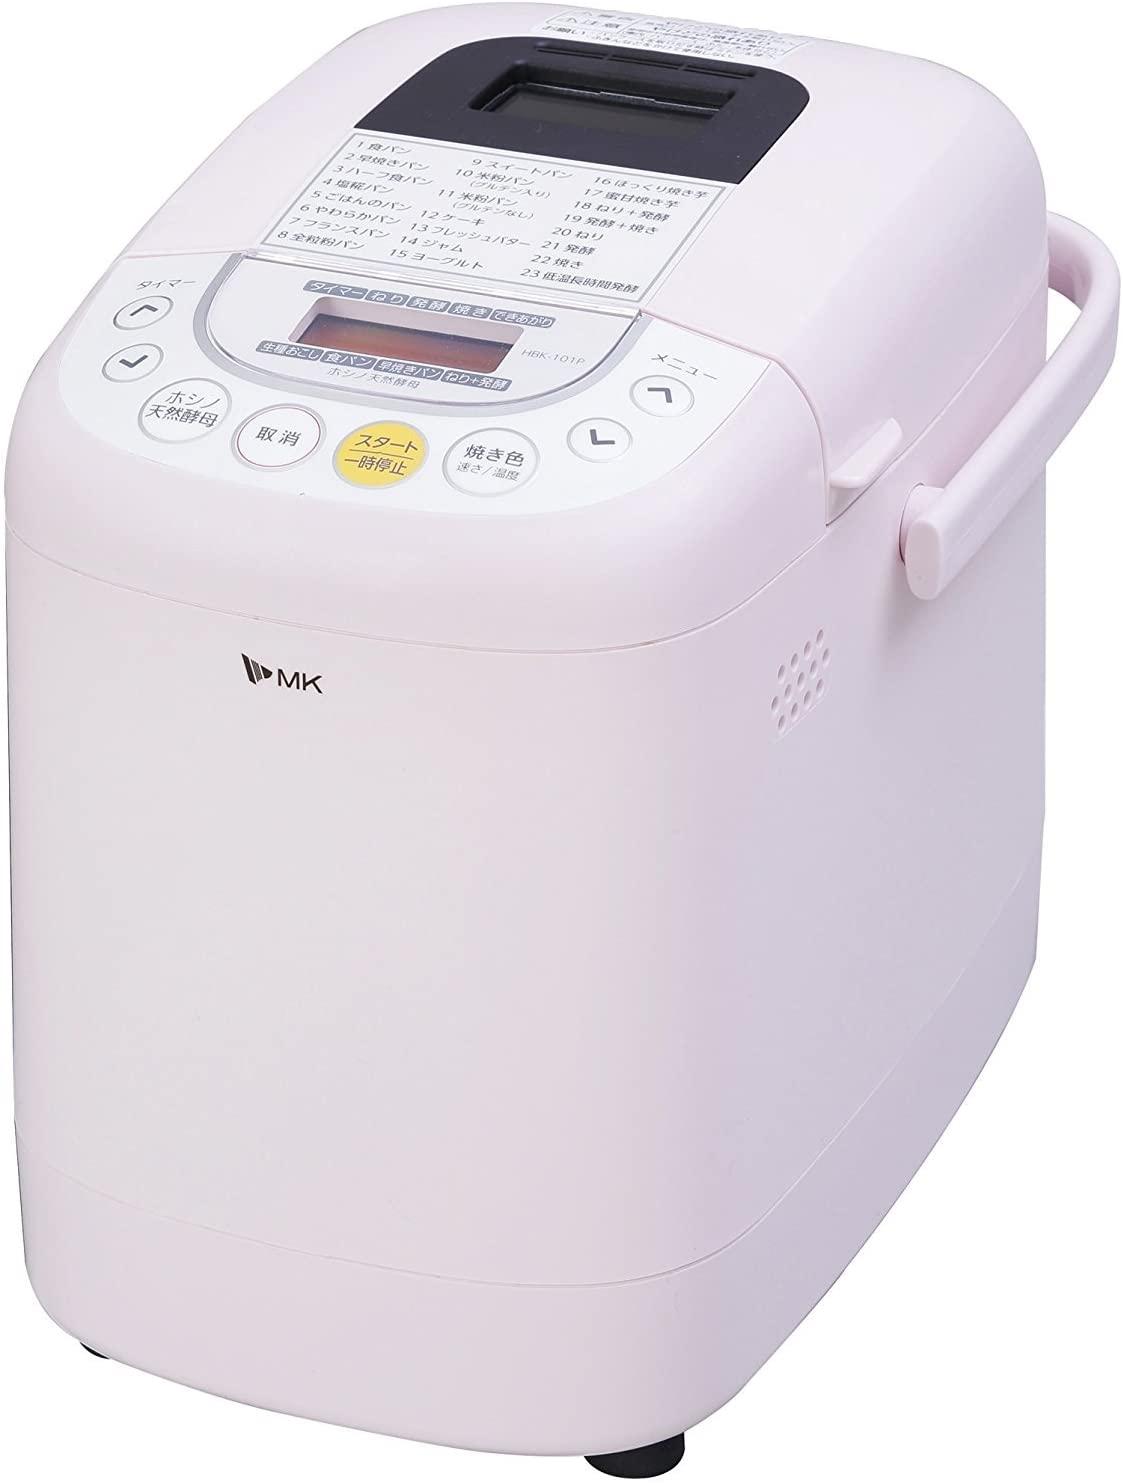 MK精工(エムケー精工)ふっくらパン屋さん (ホームベーカリー1斤タイプ) HBK-101Pの商品画像